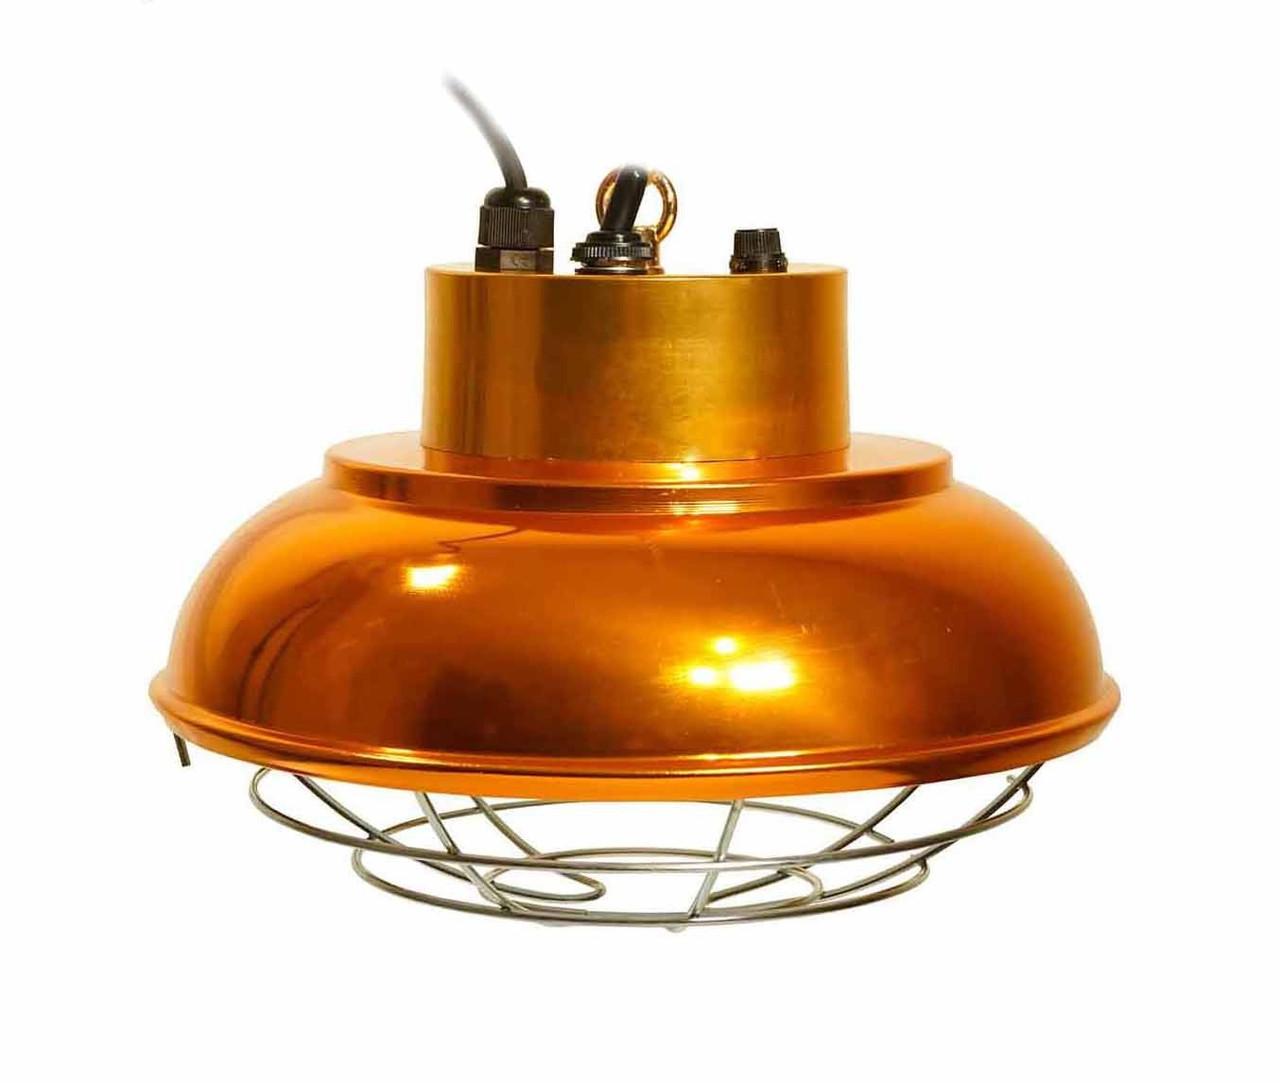 Рефлектор с галогенной лампой (абажур) Tehno MS  S1030 цвет бронза